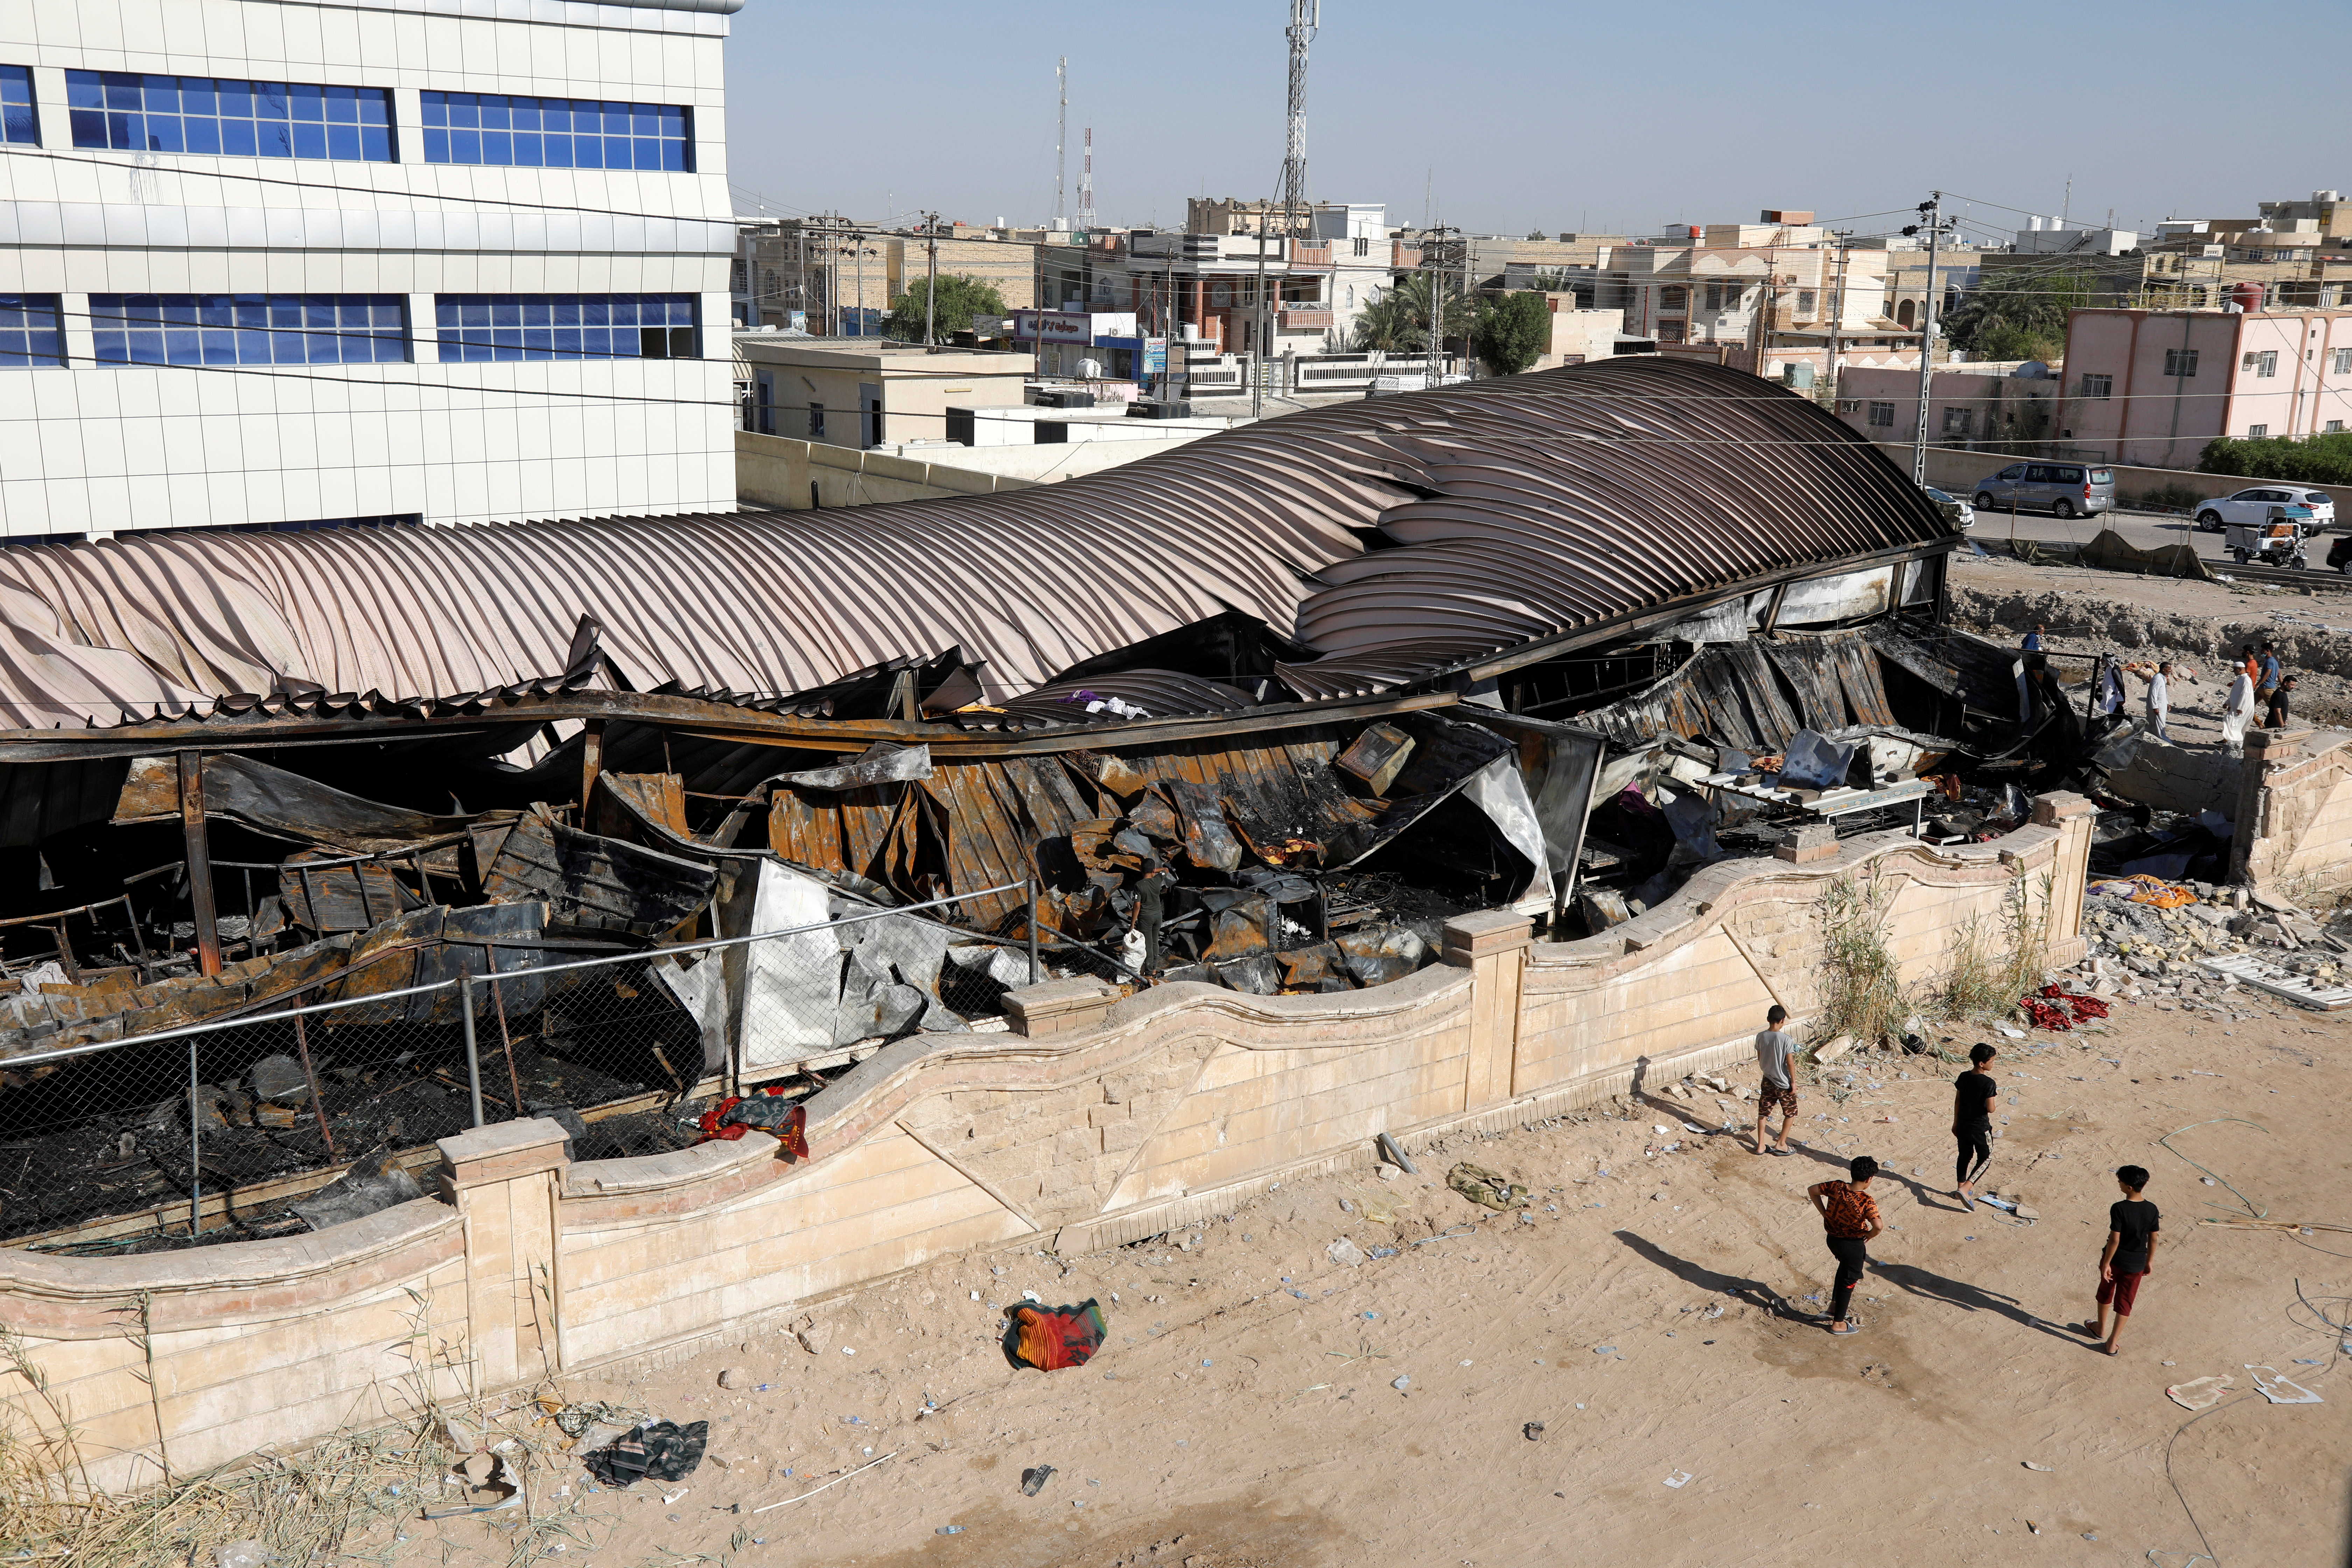 People walk past the damaged al-Hussain coronavirus hospital after a fire broke out in Nassiriya, Iraq, July 13, 2021. REUTERS/Khalid al-Mousily